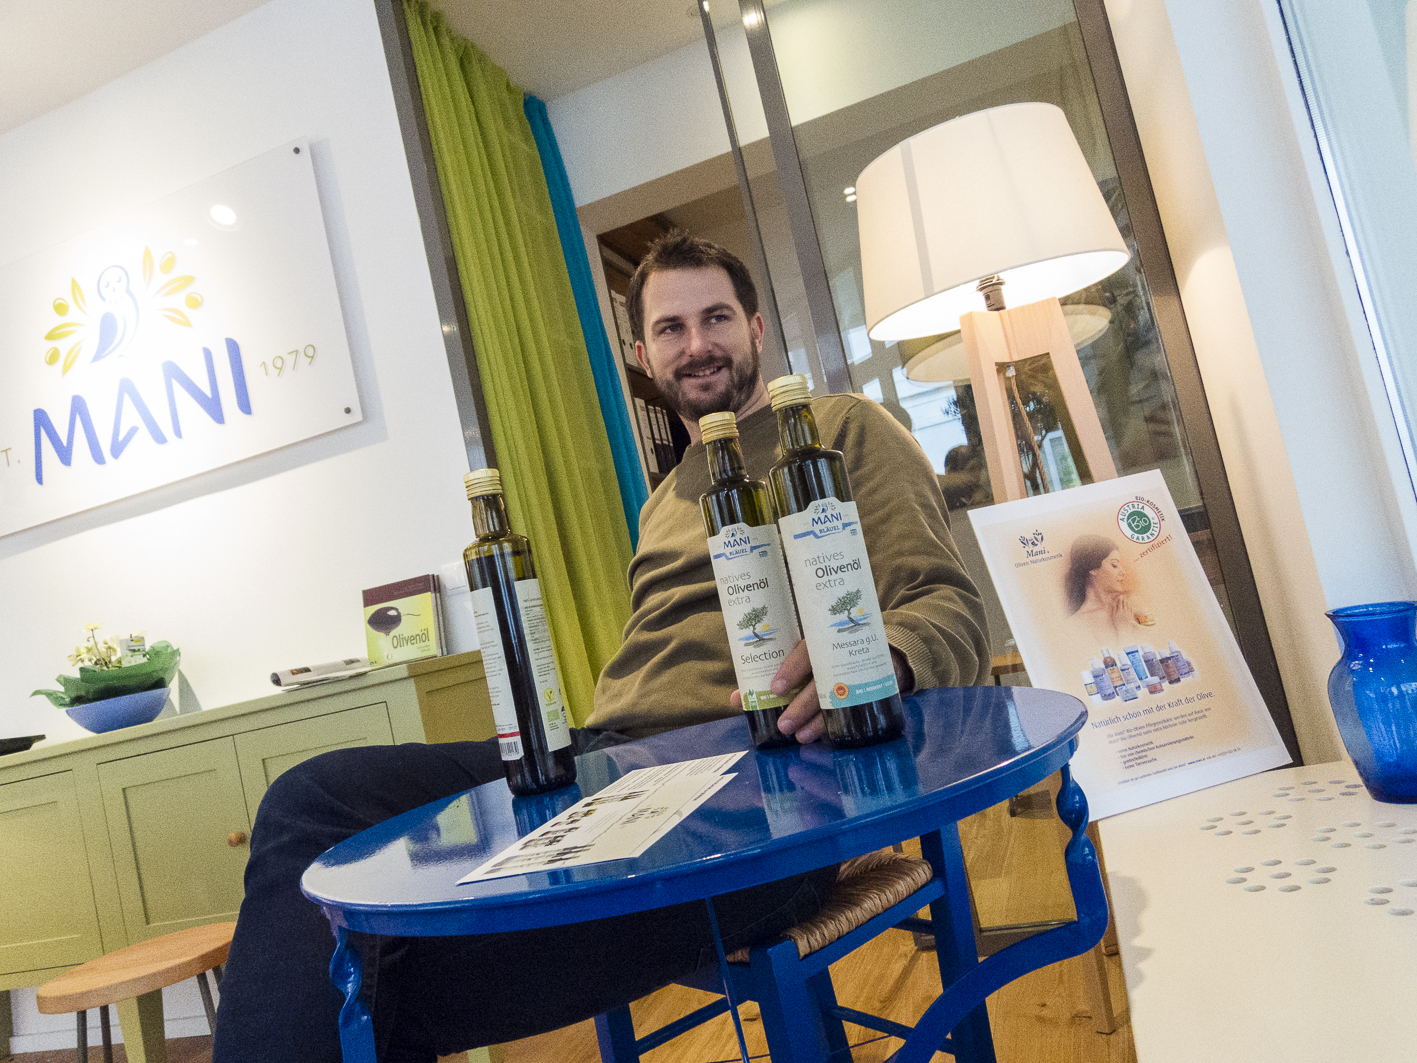 Mani Bio-Olivenöl Felix Bläuel Seidengasse 32 Wien Geschäftslokal